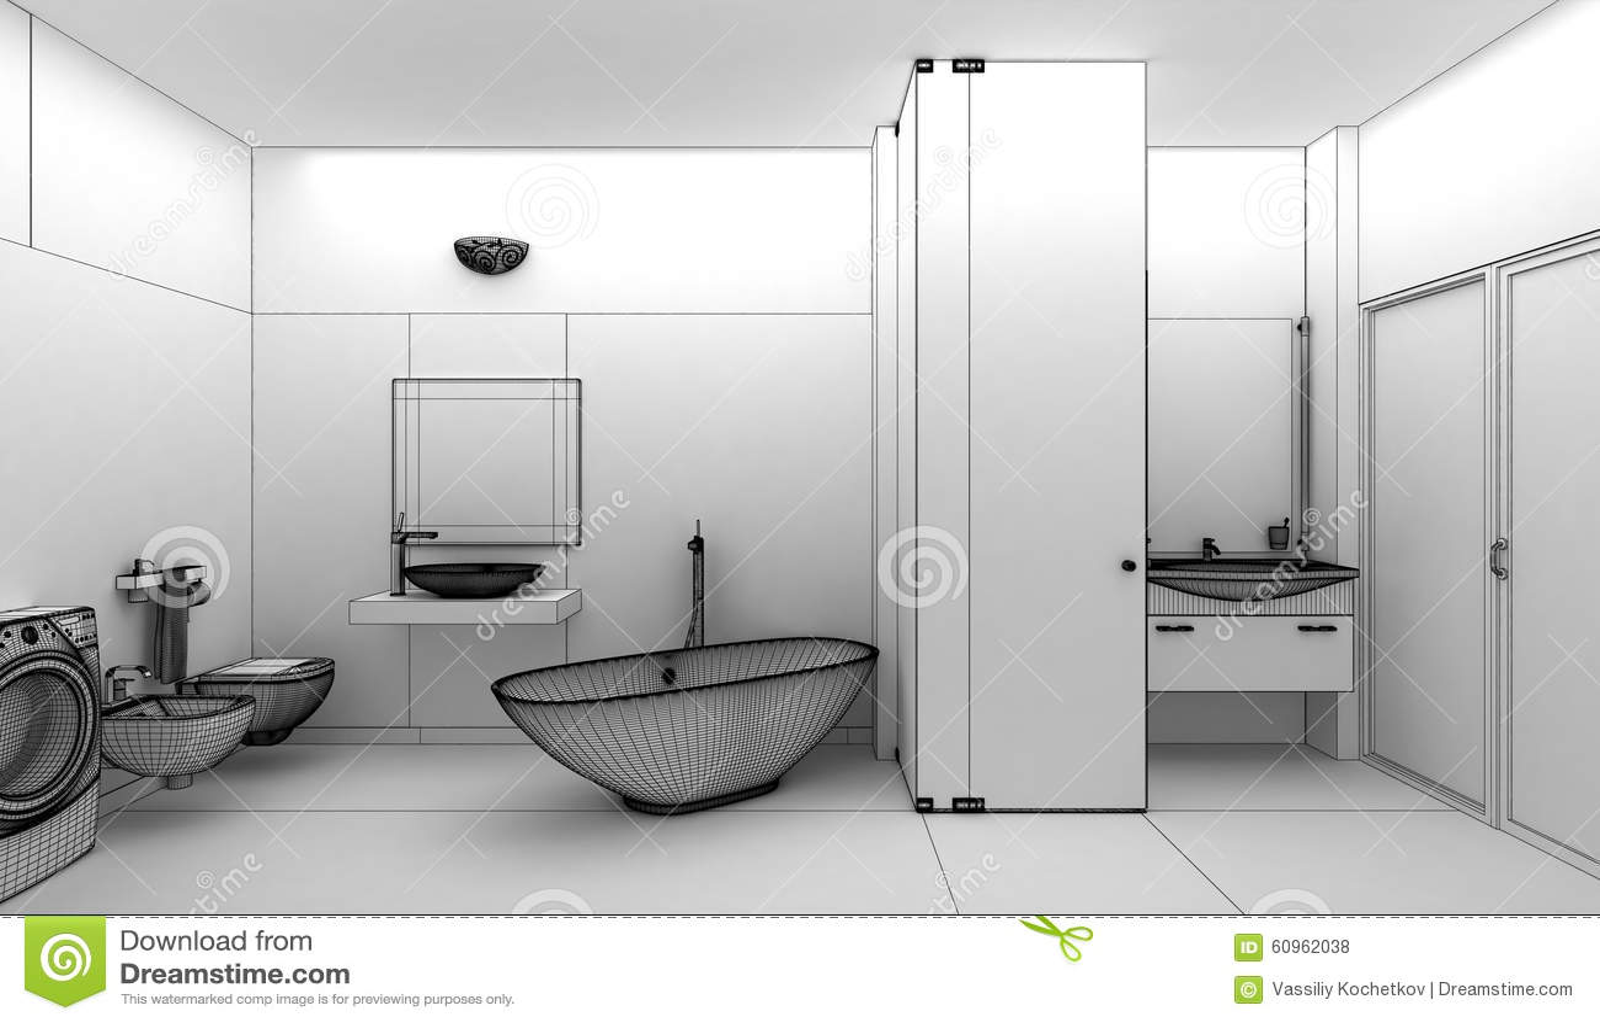 Rendering 3d of a modern bathroom interior design stock for Bathroom interior design 3d